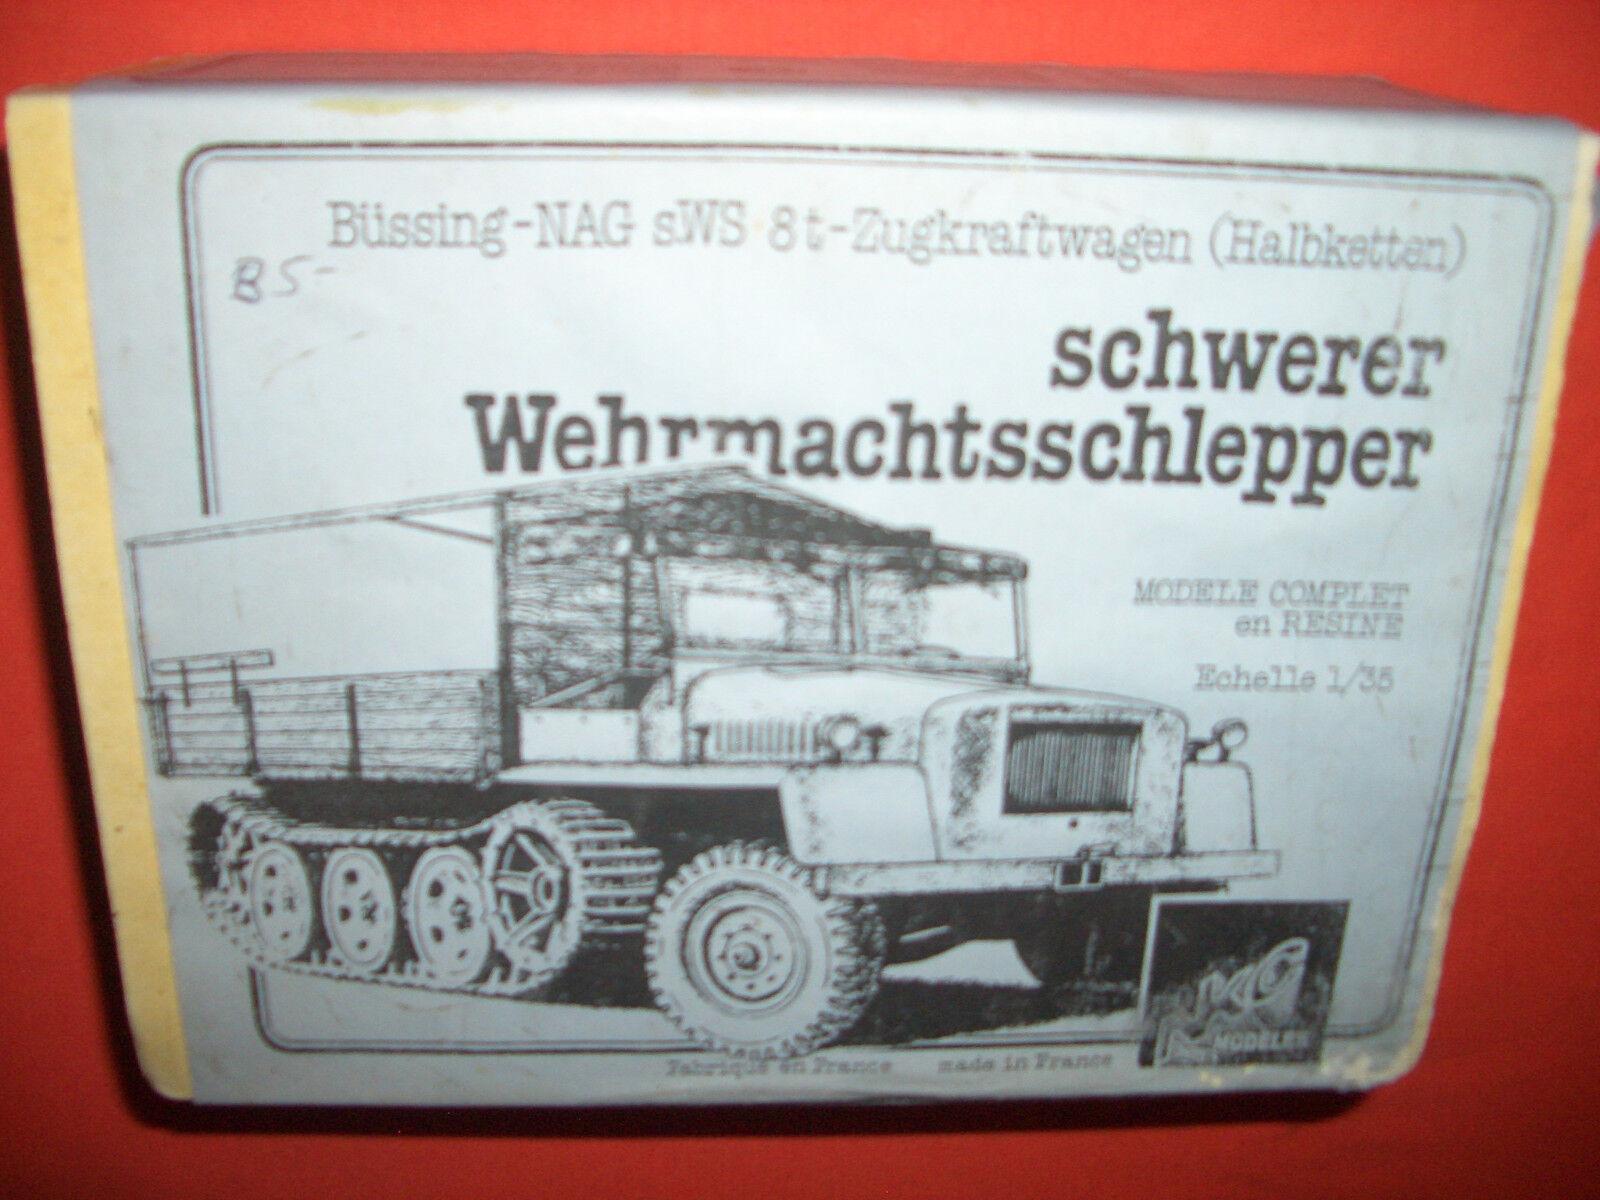 1 35 NKC Models 163590, Schwerer WEHRMACHTSSCHLEPPER Büssing NAG sWS 8t